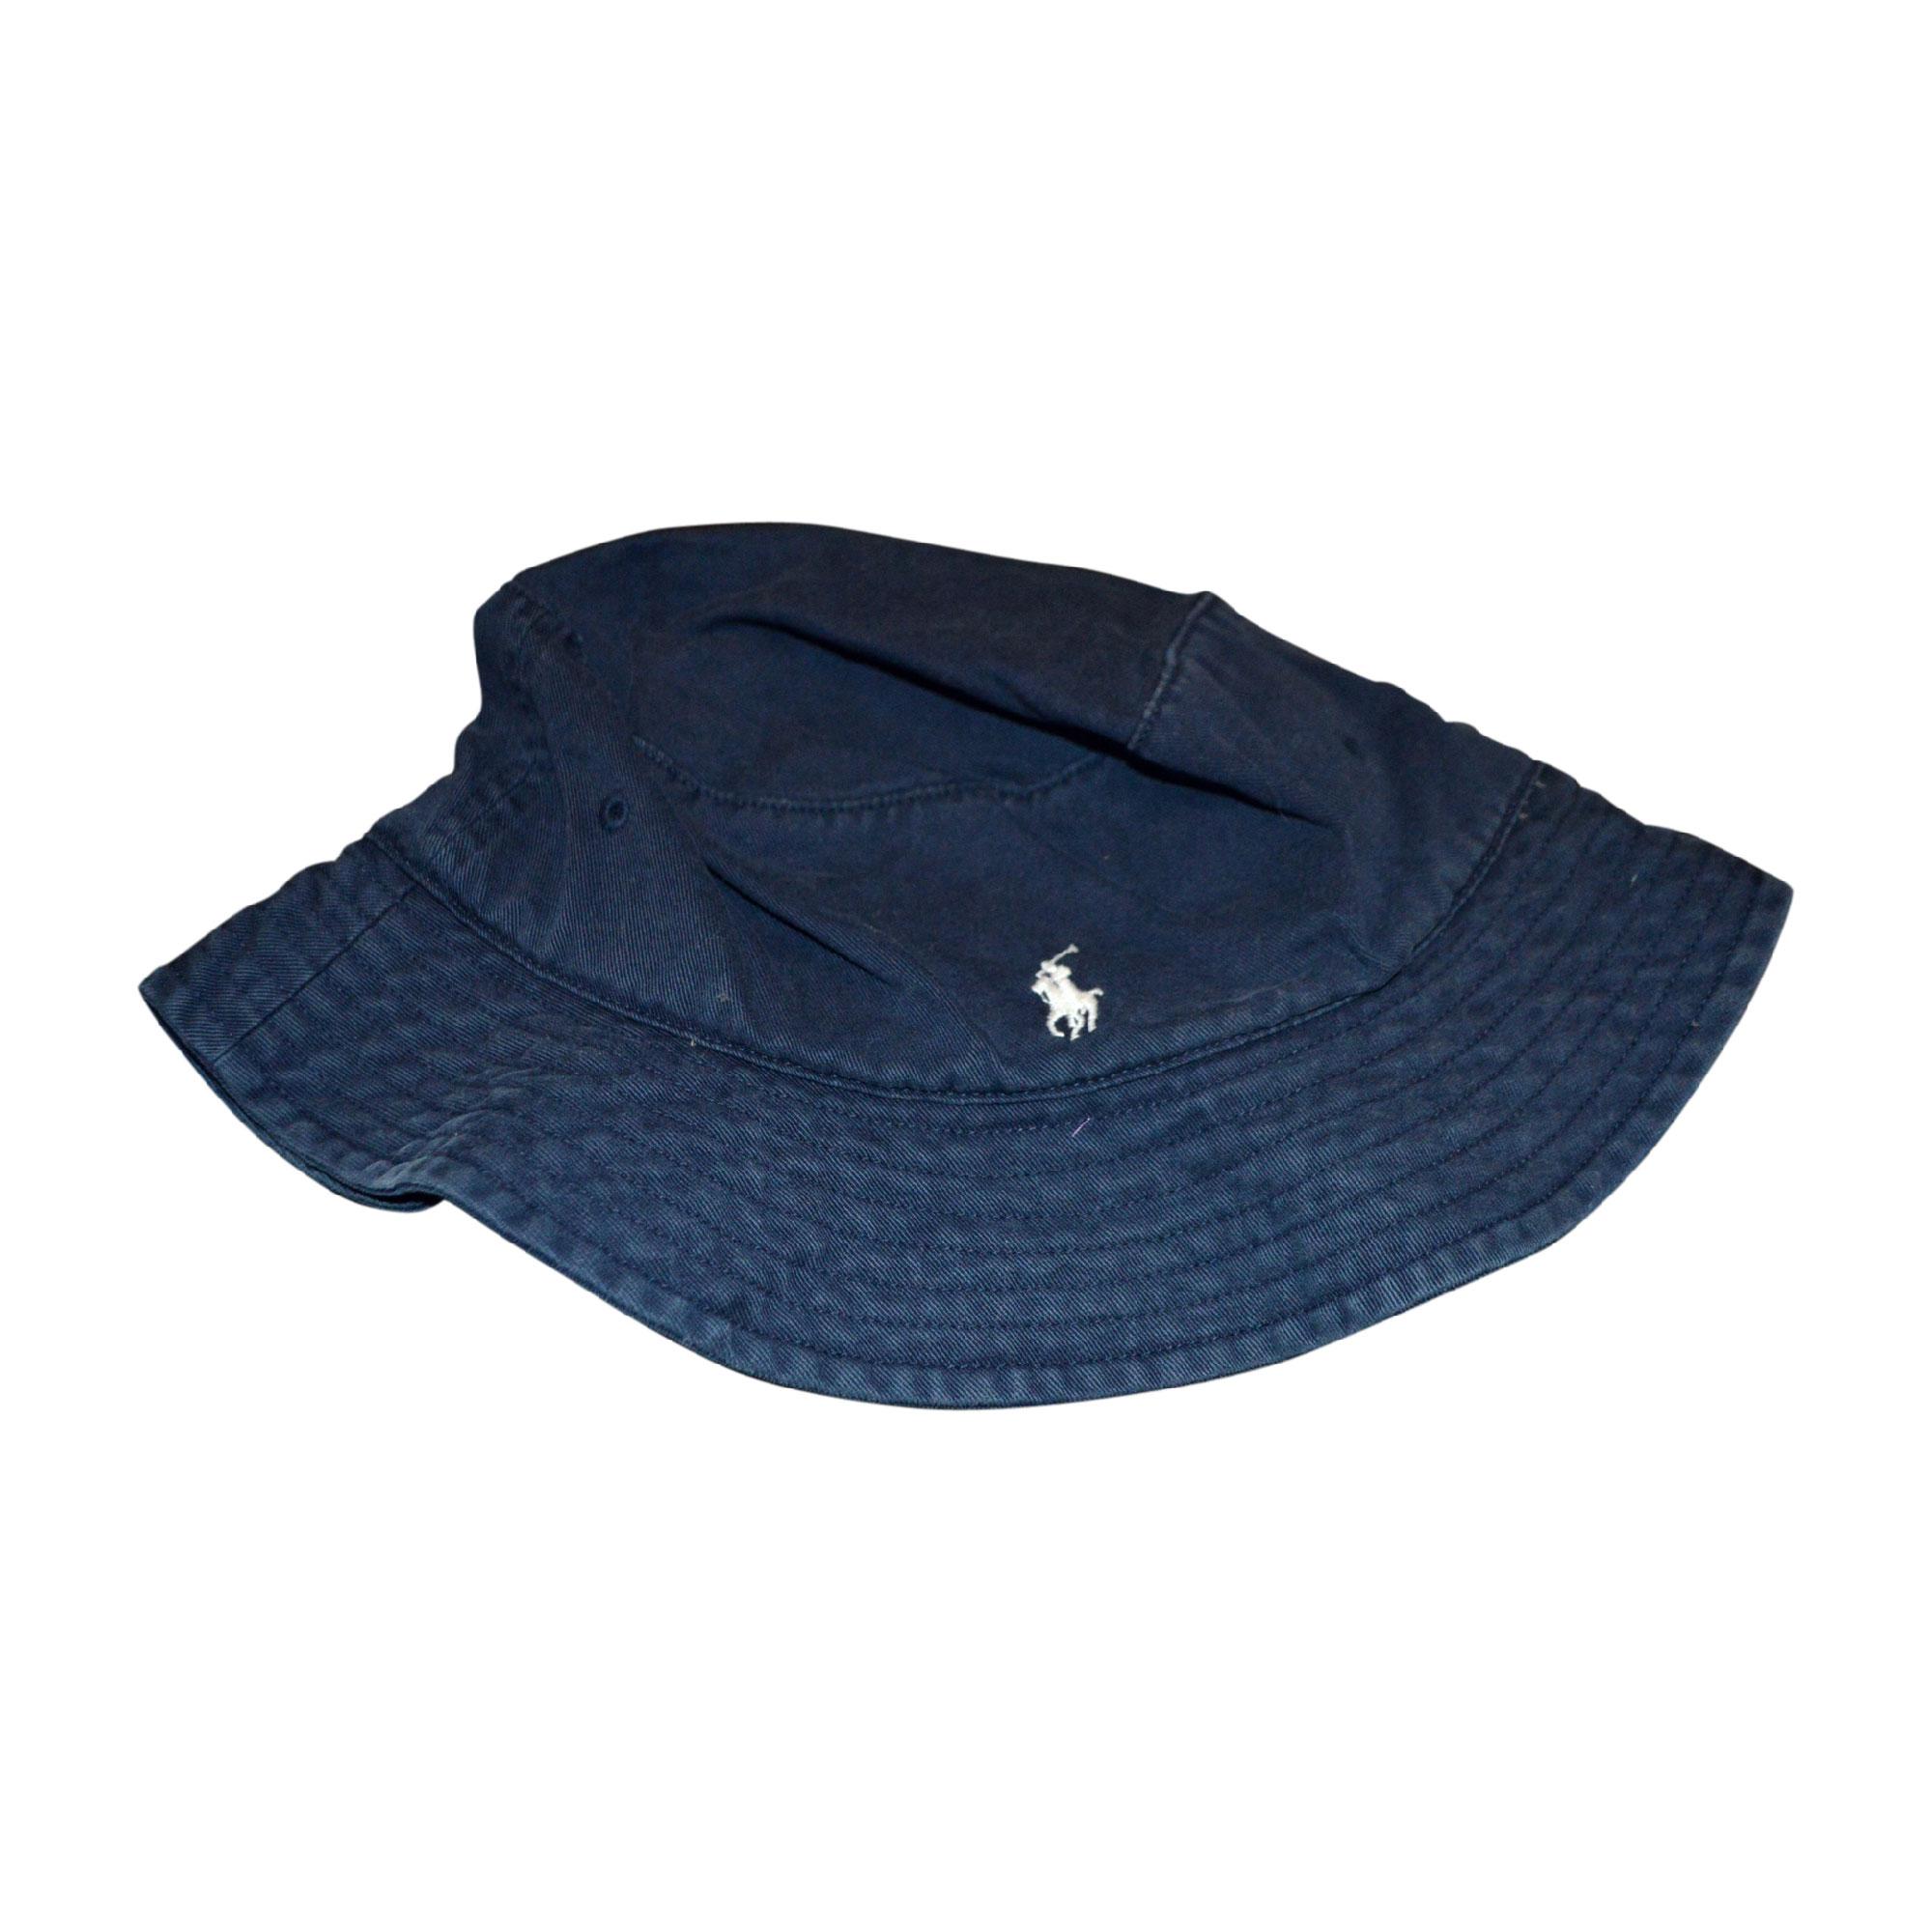 40afe9b07771 Bob RALPH LAUREN Autre bleu vendu par Aurélieb.51719 - 4374918